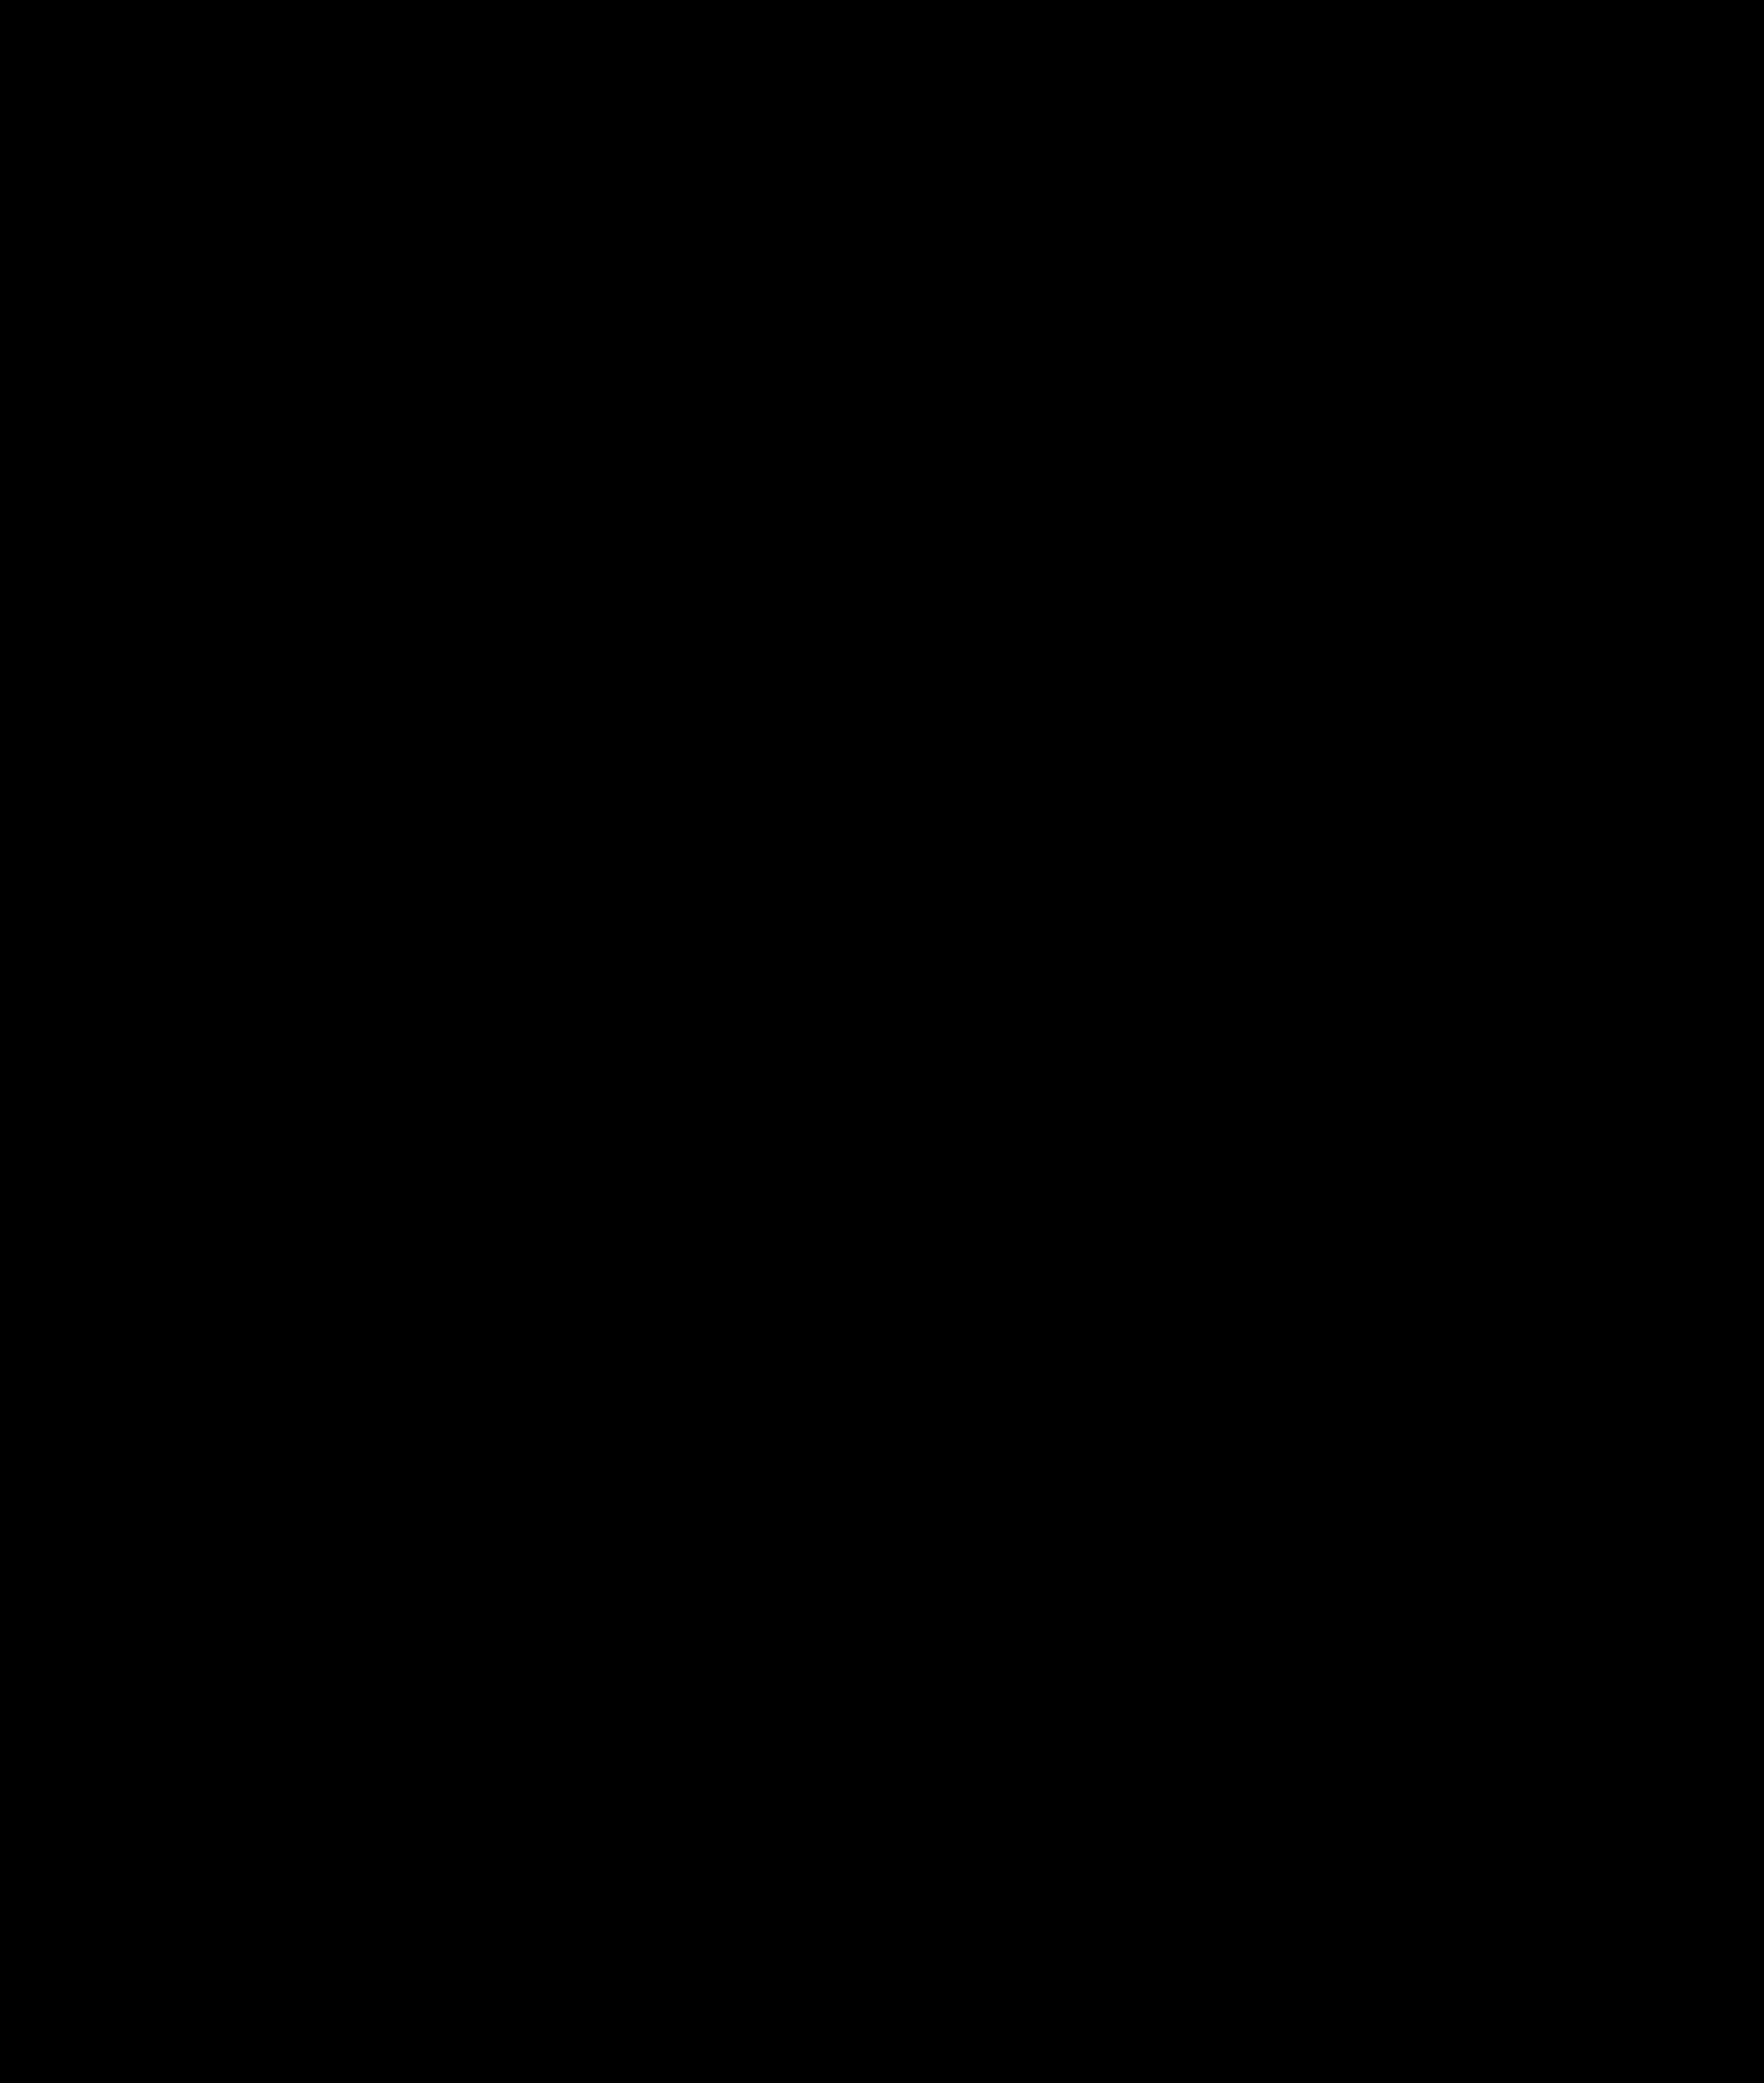 2033x2400 Clipart